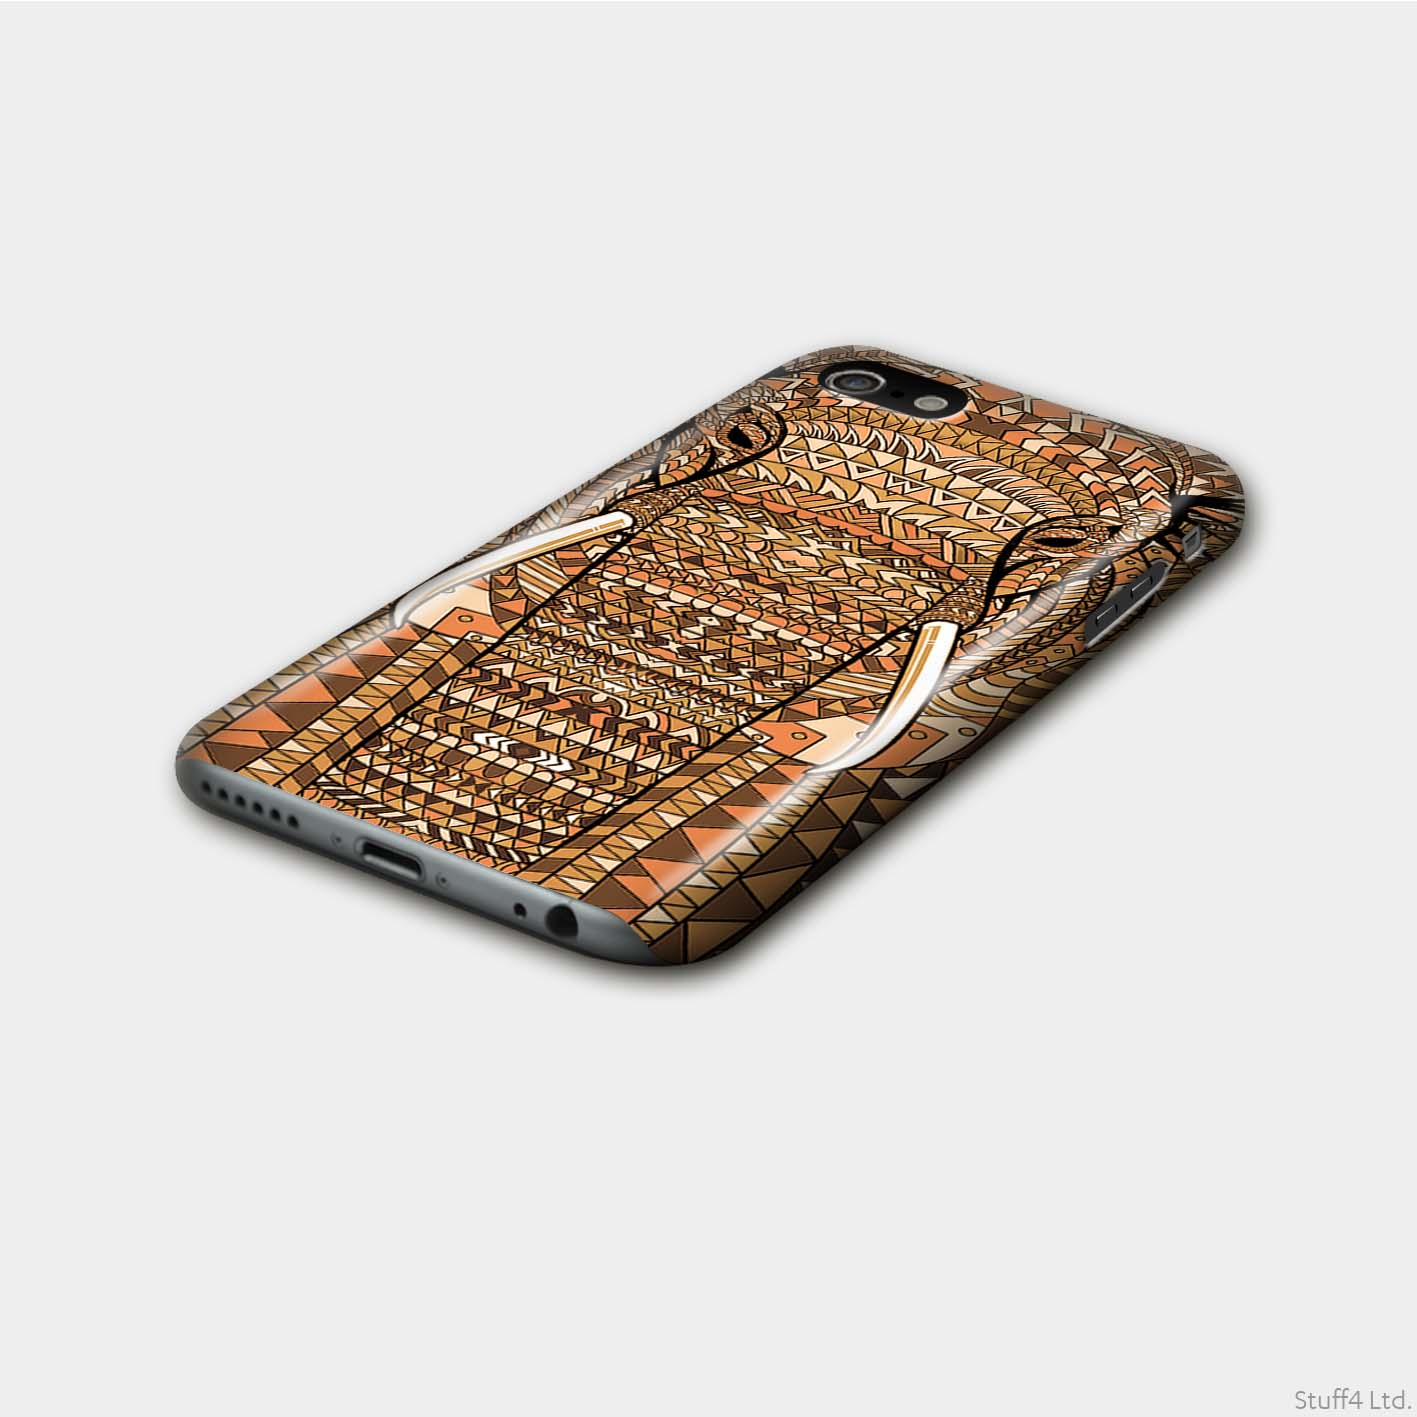 Matte-Phone-Case-for-Apple-iPhone-8-Plus-Aztec-Animal-Design thumbnail 7